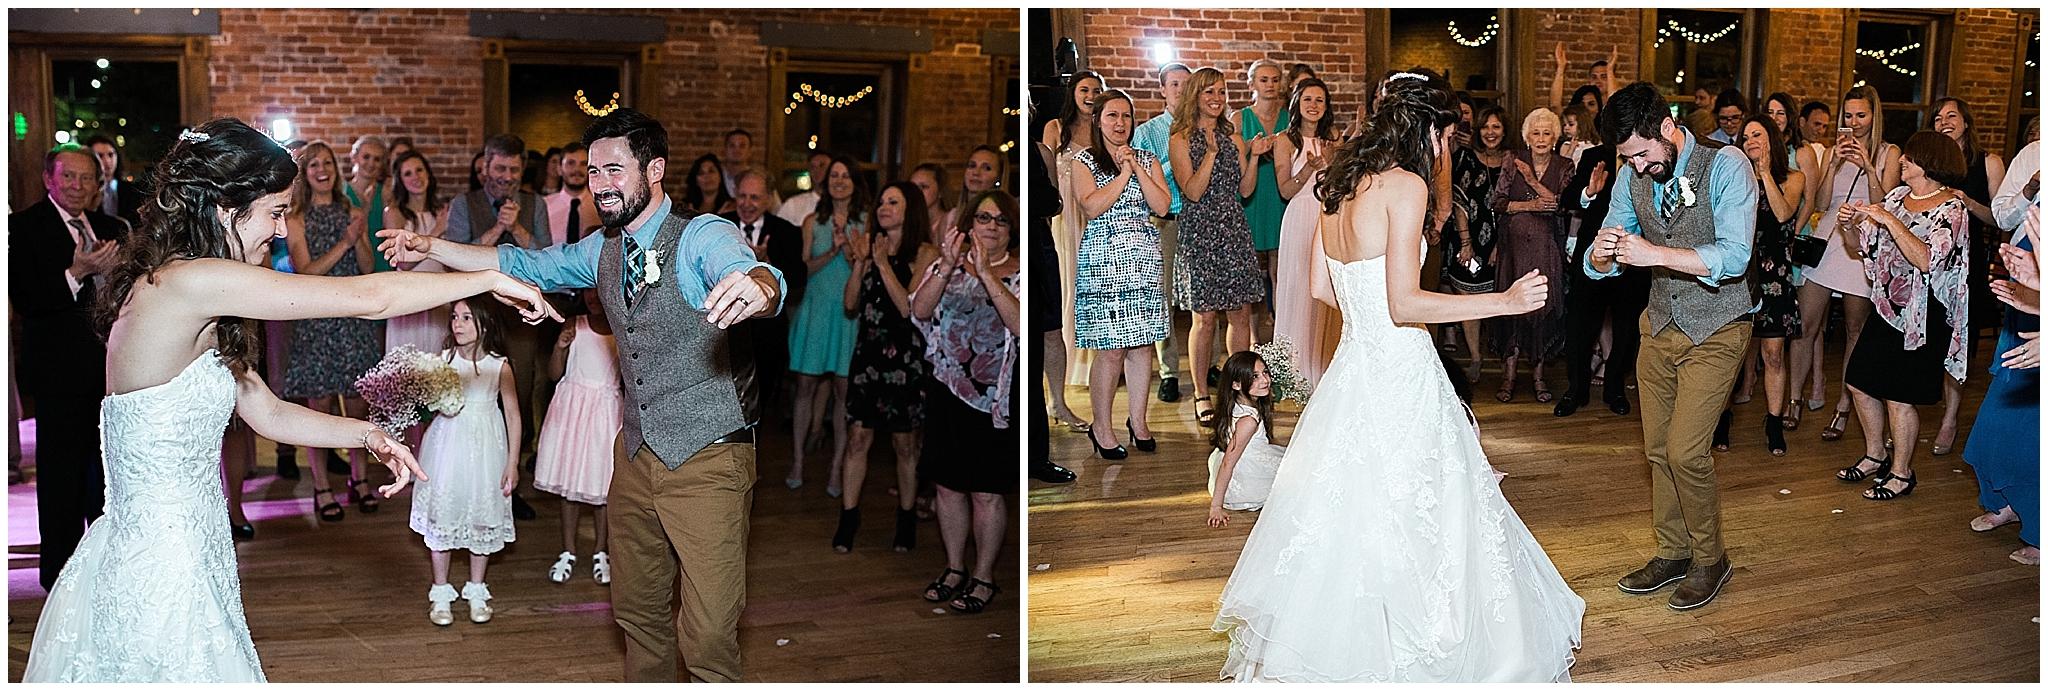 Wedding_Asheville_Century_Room_23.jpg